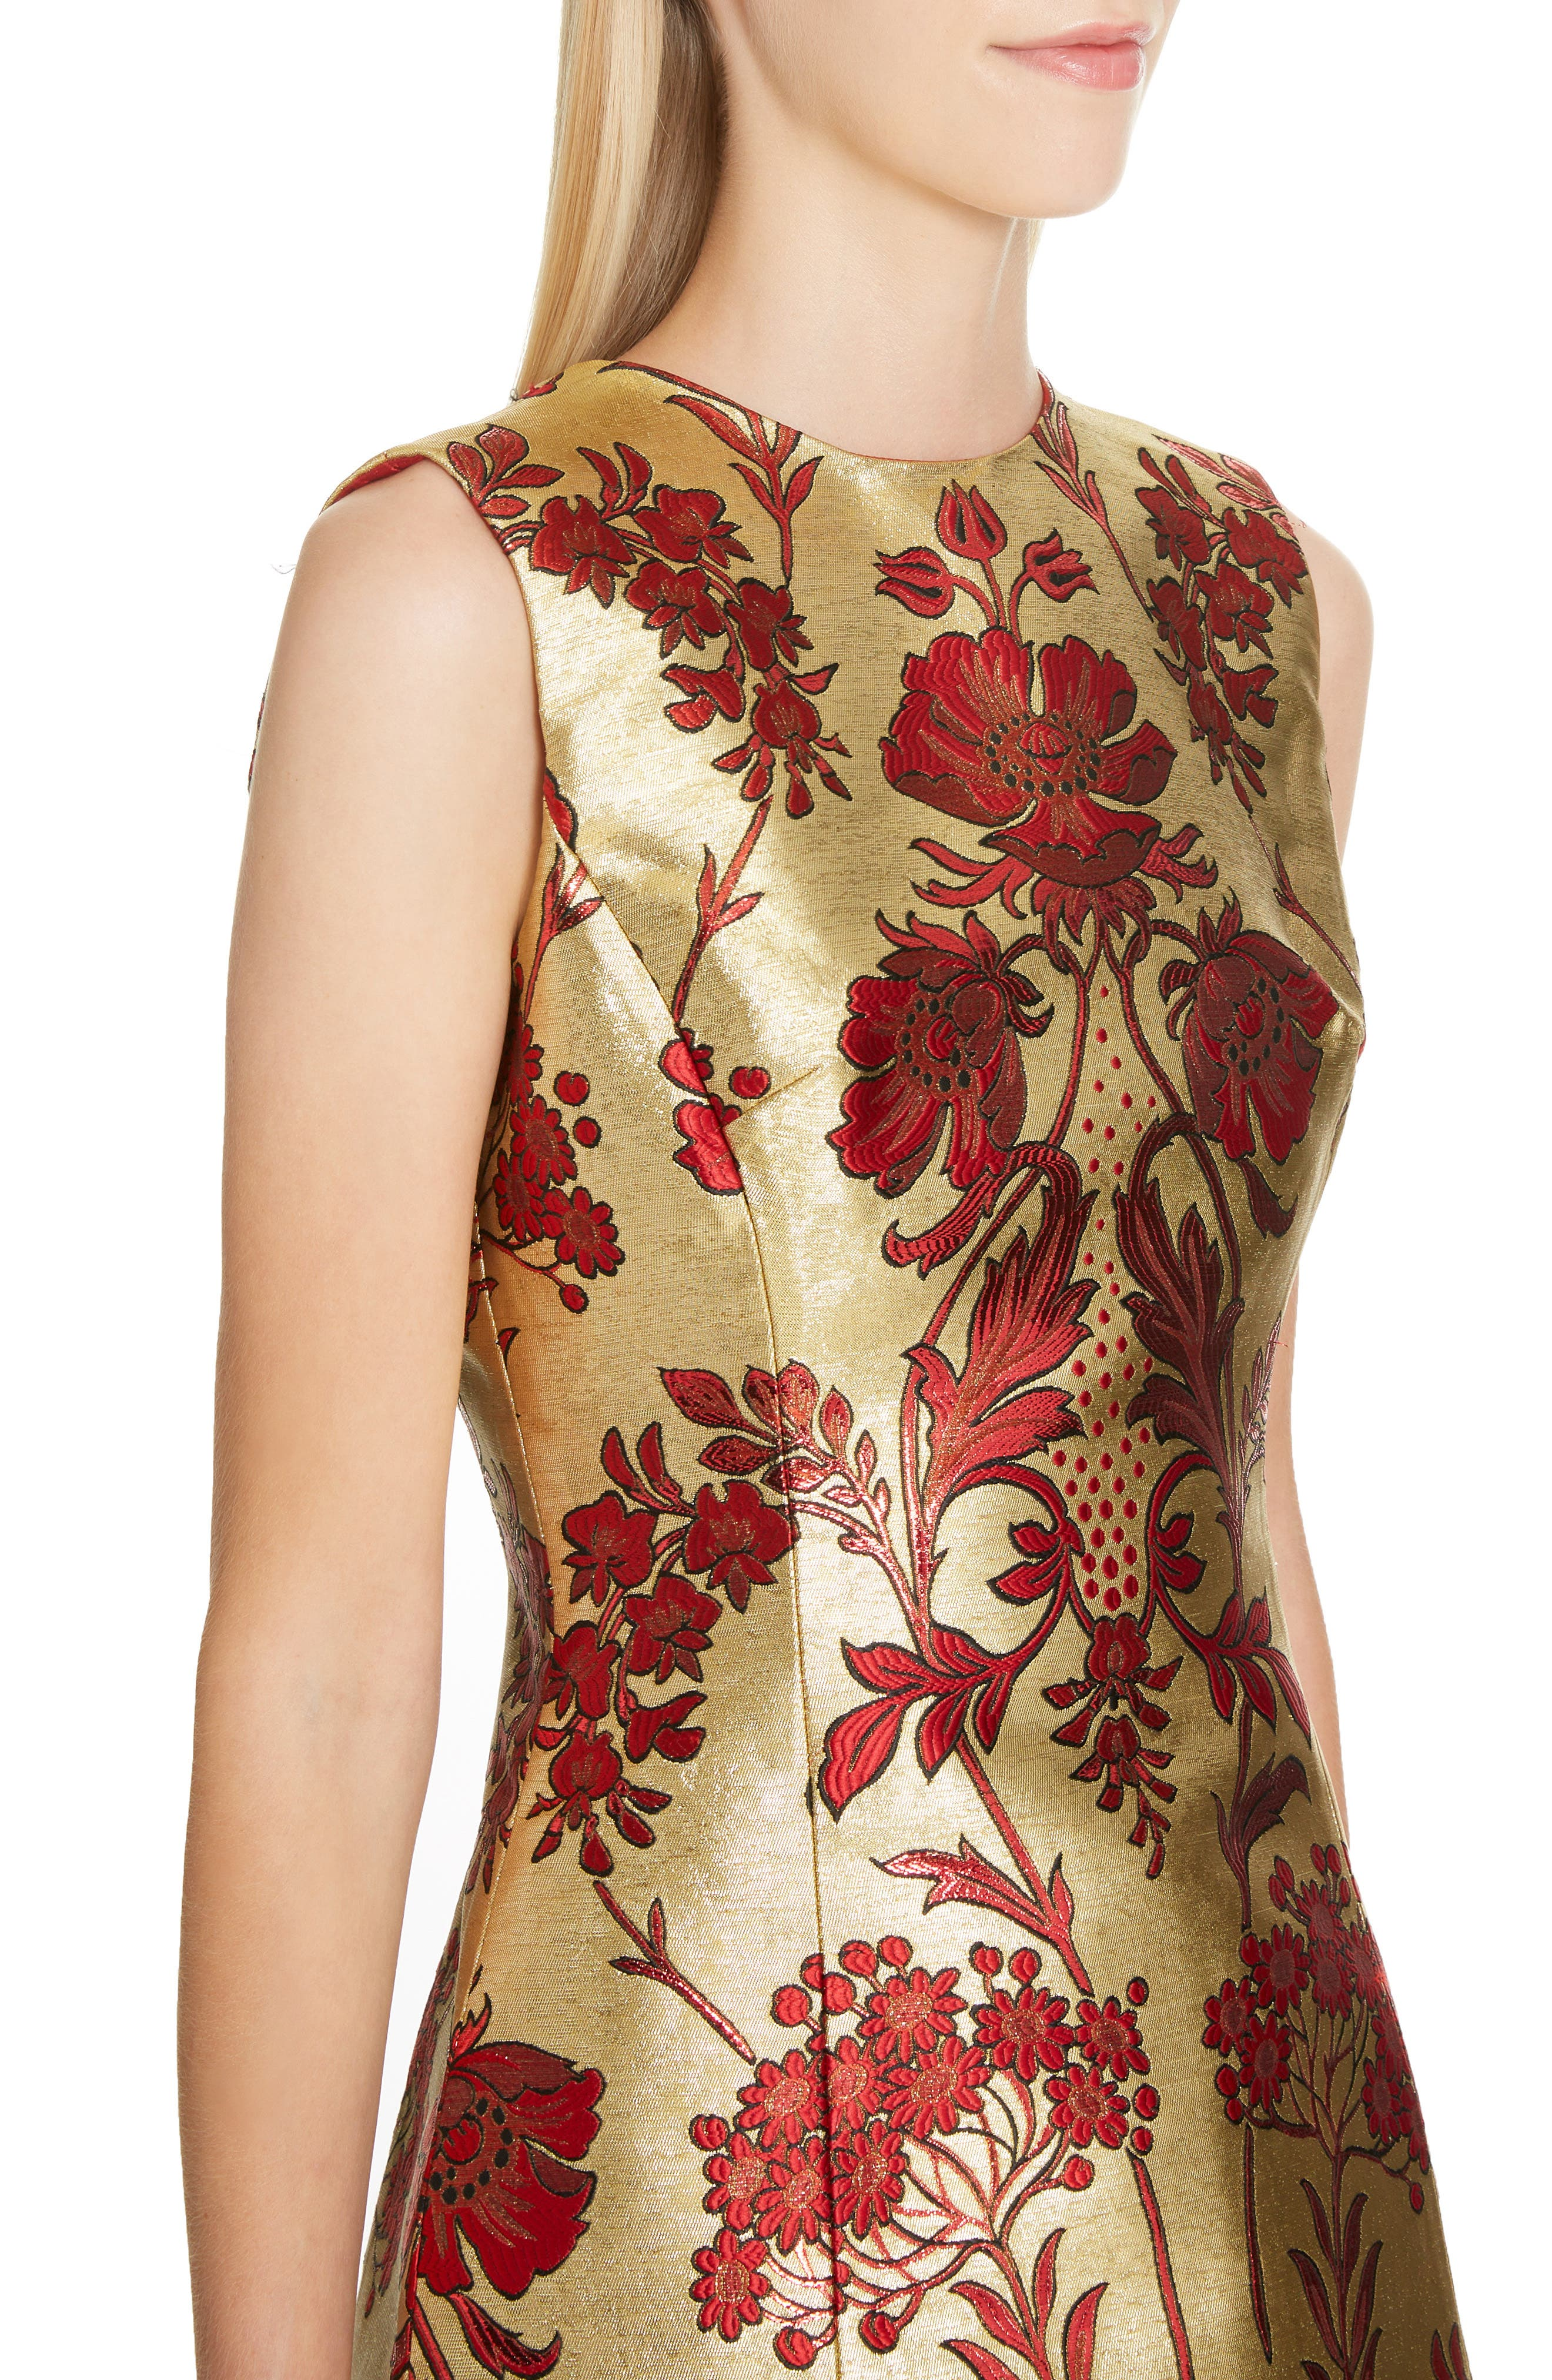 Metallic Jacquard A-Line Dress,                             Alternate thumbnail 4, color,                             S8351 JACQUARD LUREX FLORAL